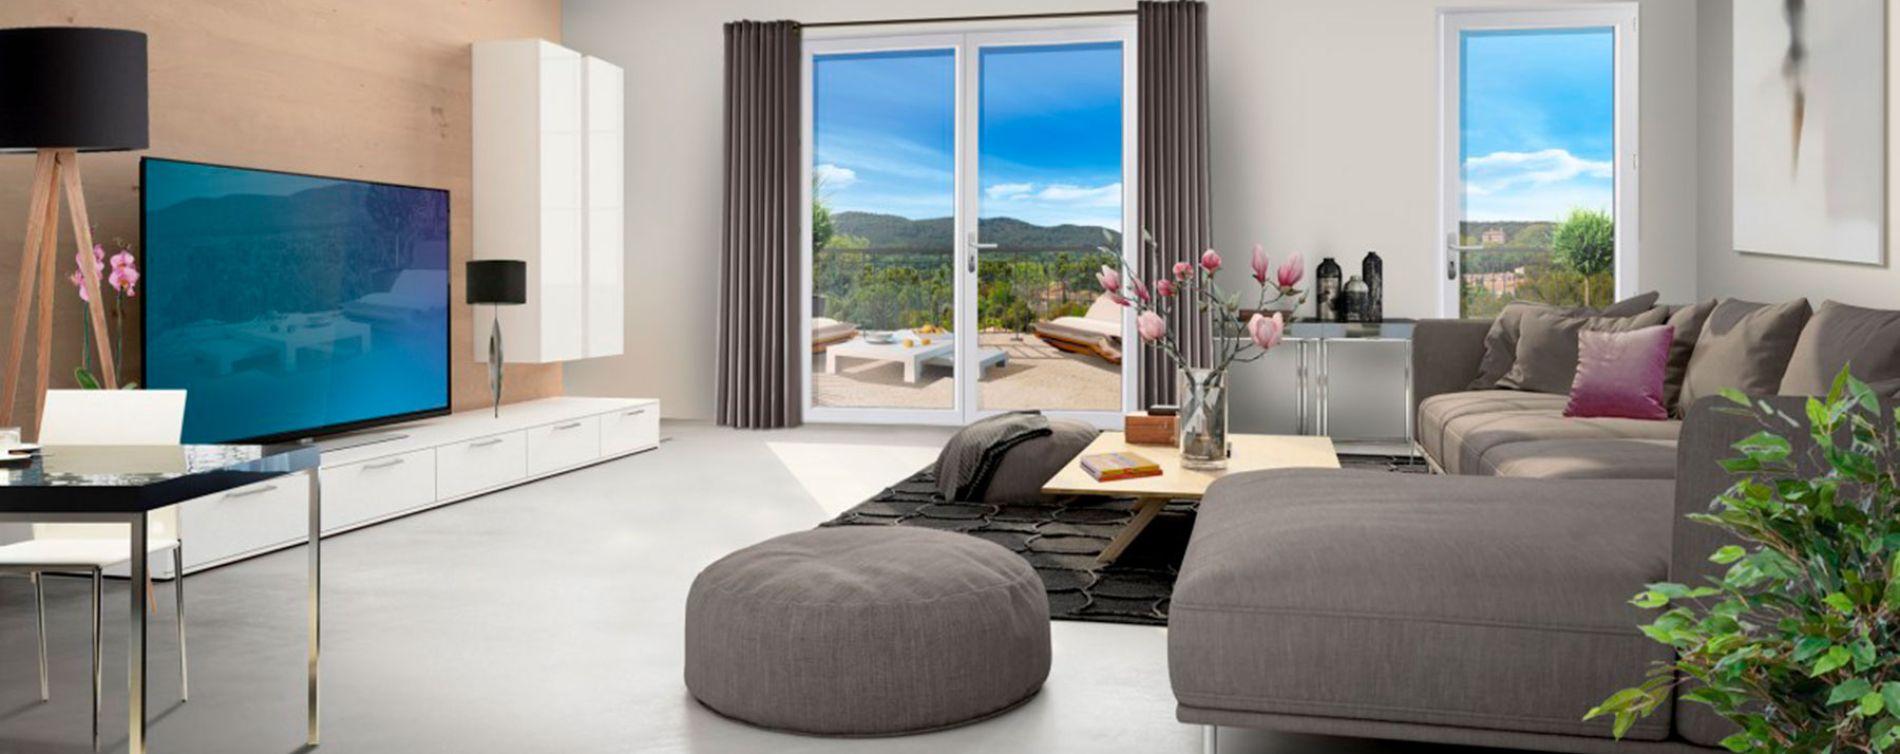 Bormes-les-Mimosas : programme immobilier neuve « Loderi » (5)